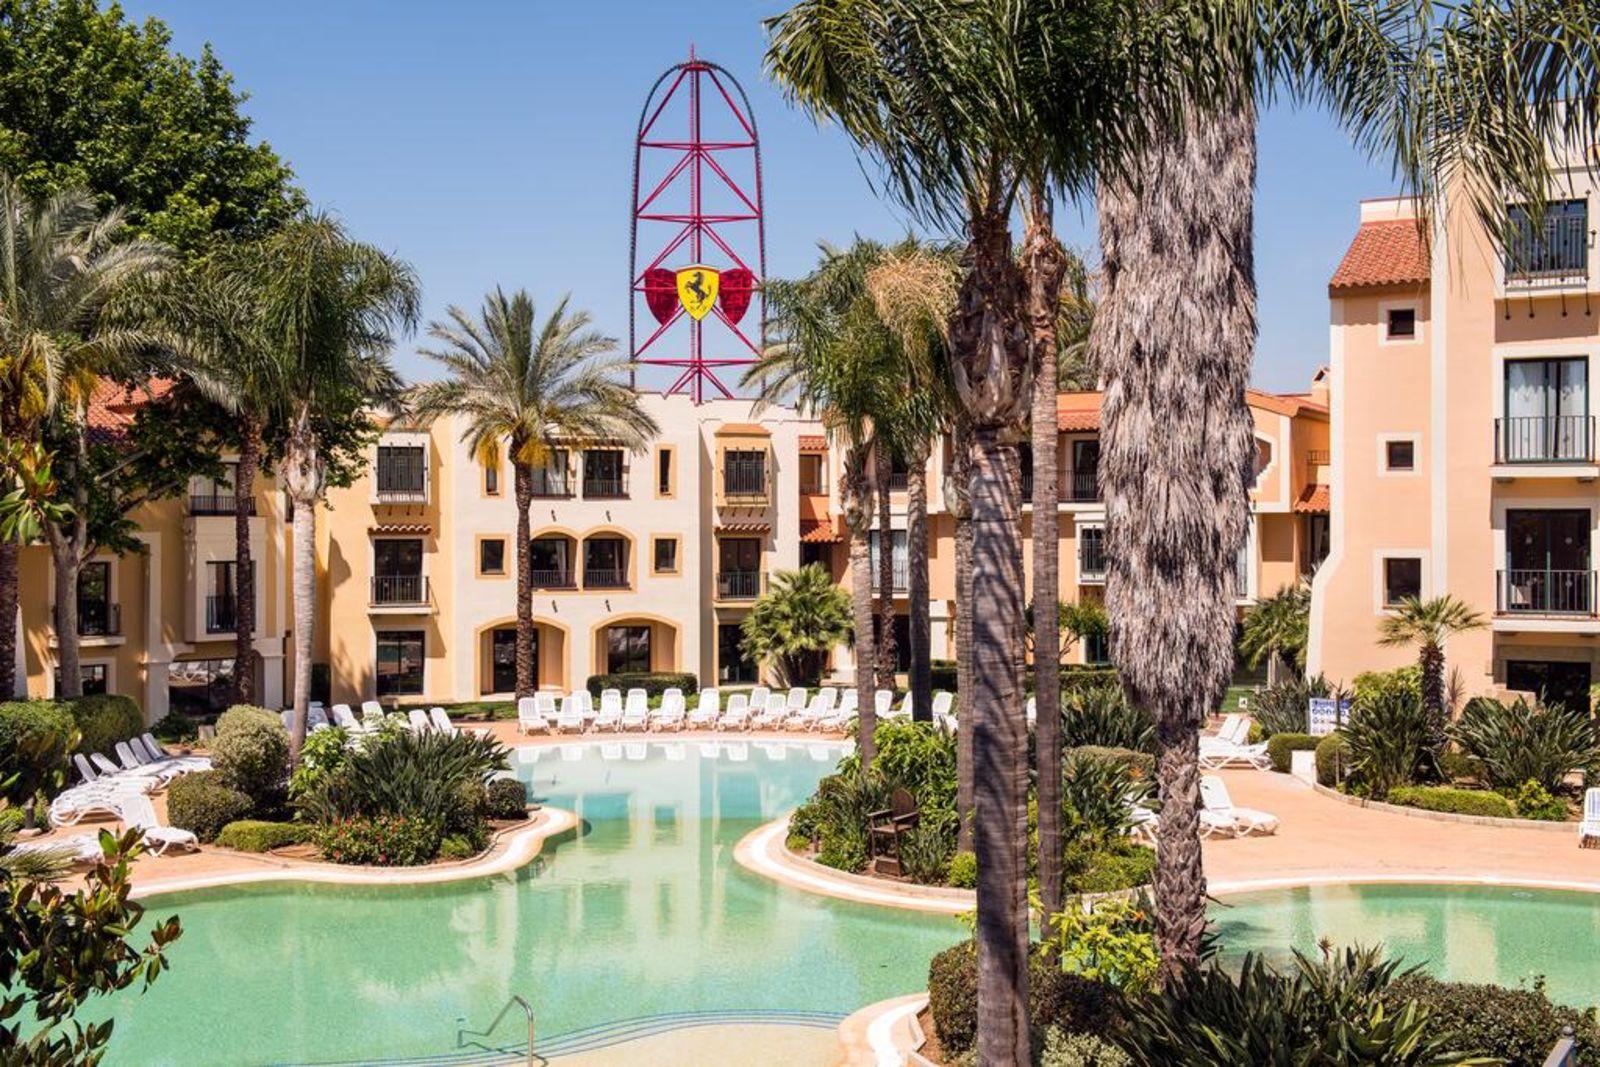 mediavault_images/Portaventura hotel el paso 3